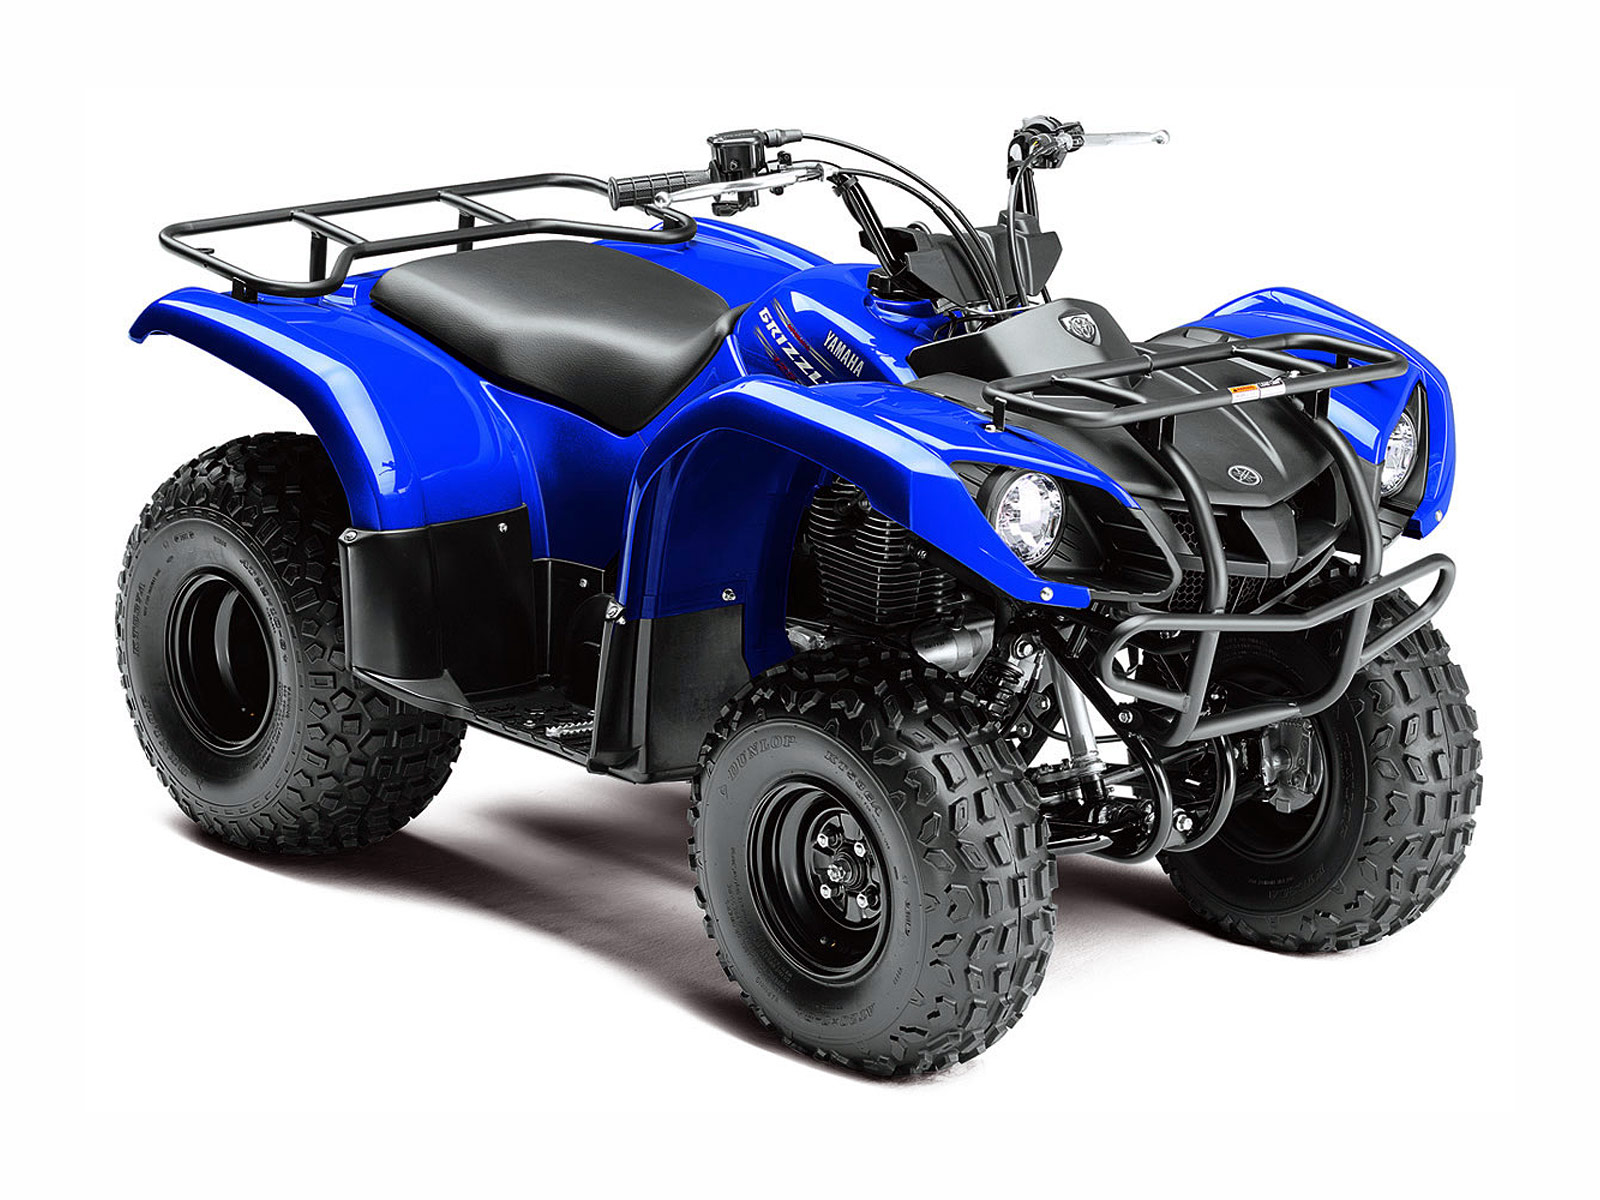 2012 Yamaha Grizzly 350 Auto Wallpaper PicsWallpapercom 1600x1200